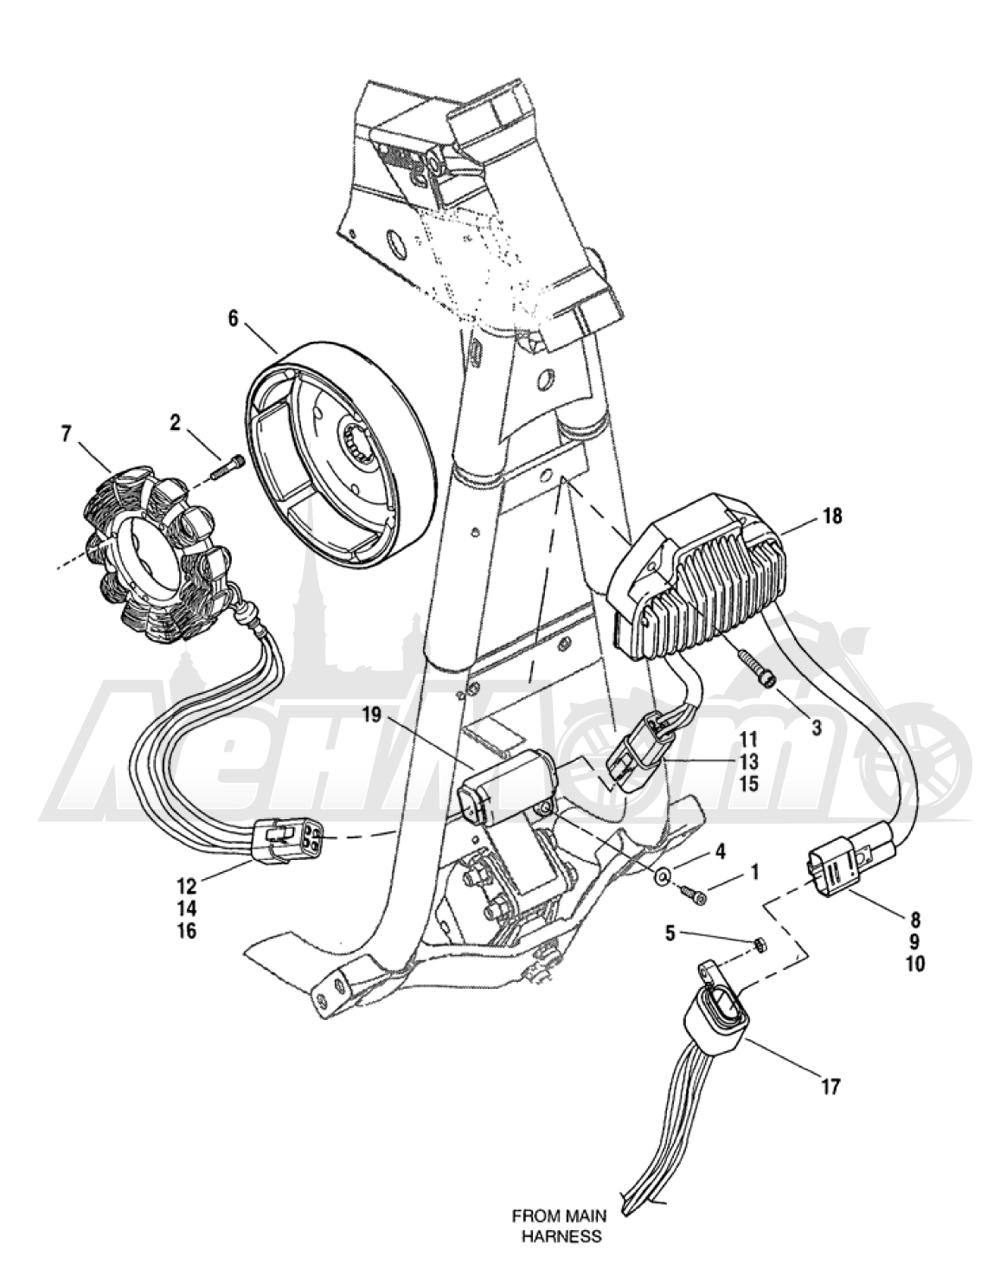 Запчасти для Мотоцикла Harley-Davidson 2005 FXDX DYNA® SUPER GLIDE SPORT (GJ) Раздел: ELECTRICAL - ALTERNATOR W/ VOLTAGE REGULATOR | электрика генератор вместе с регулятор напряжения